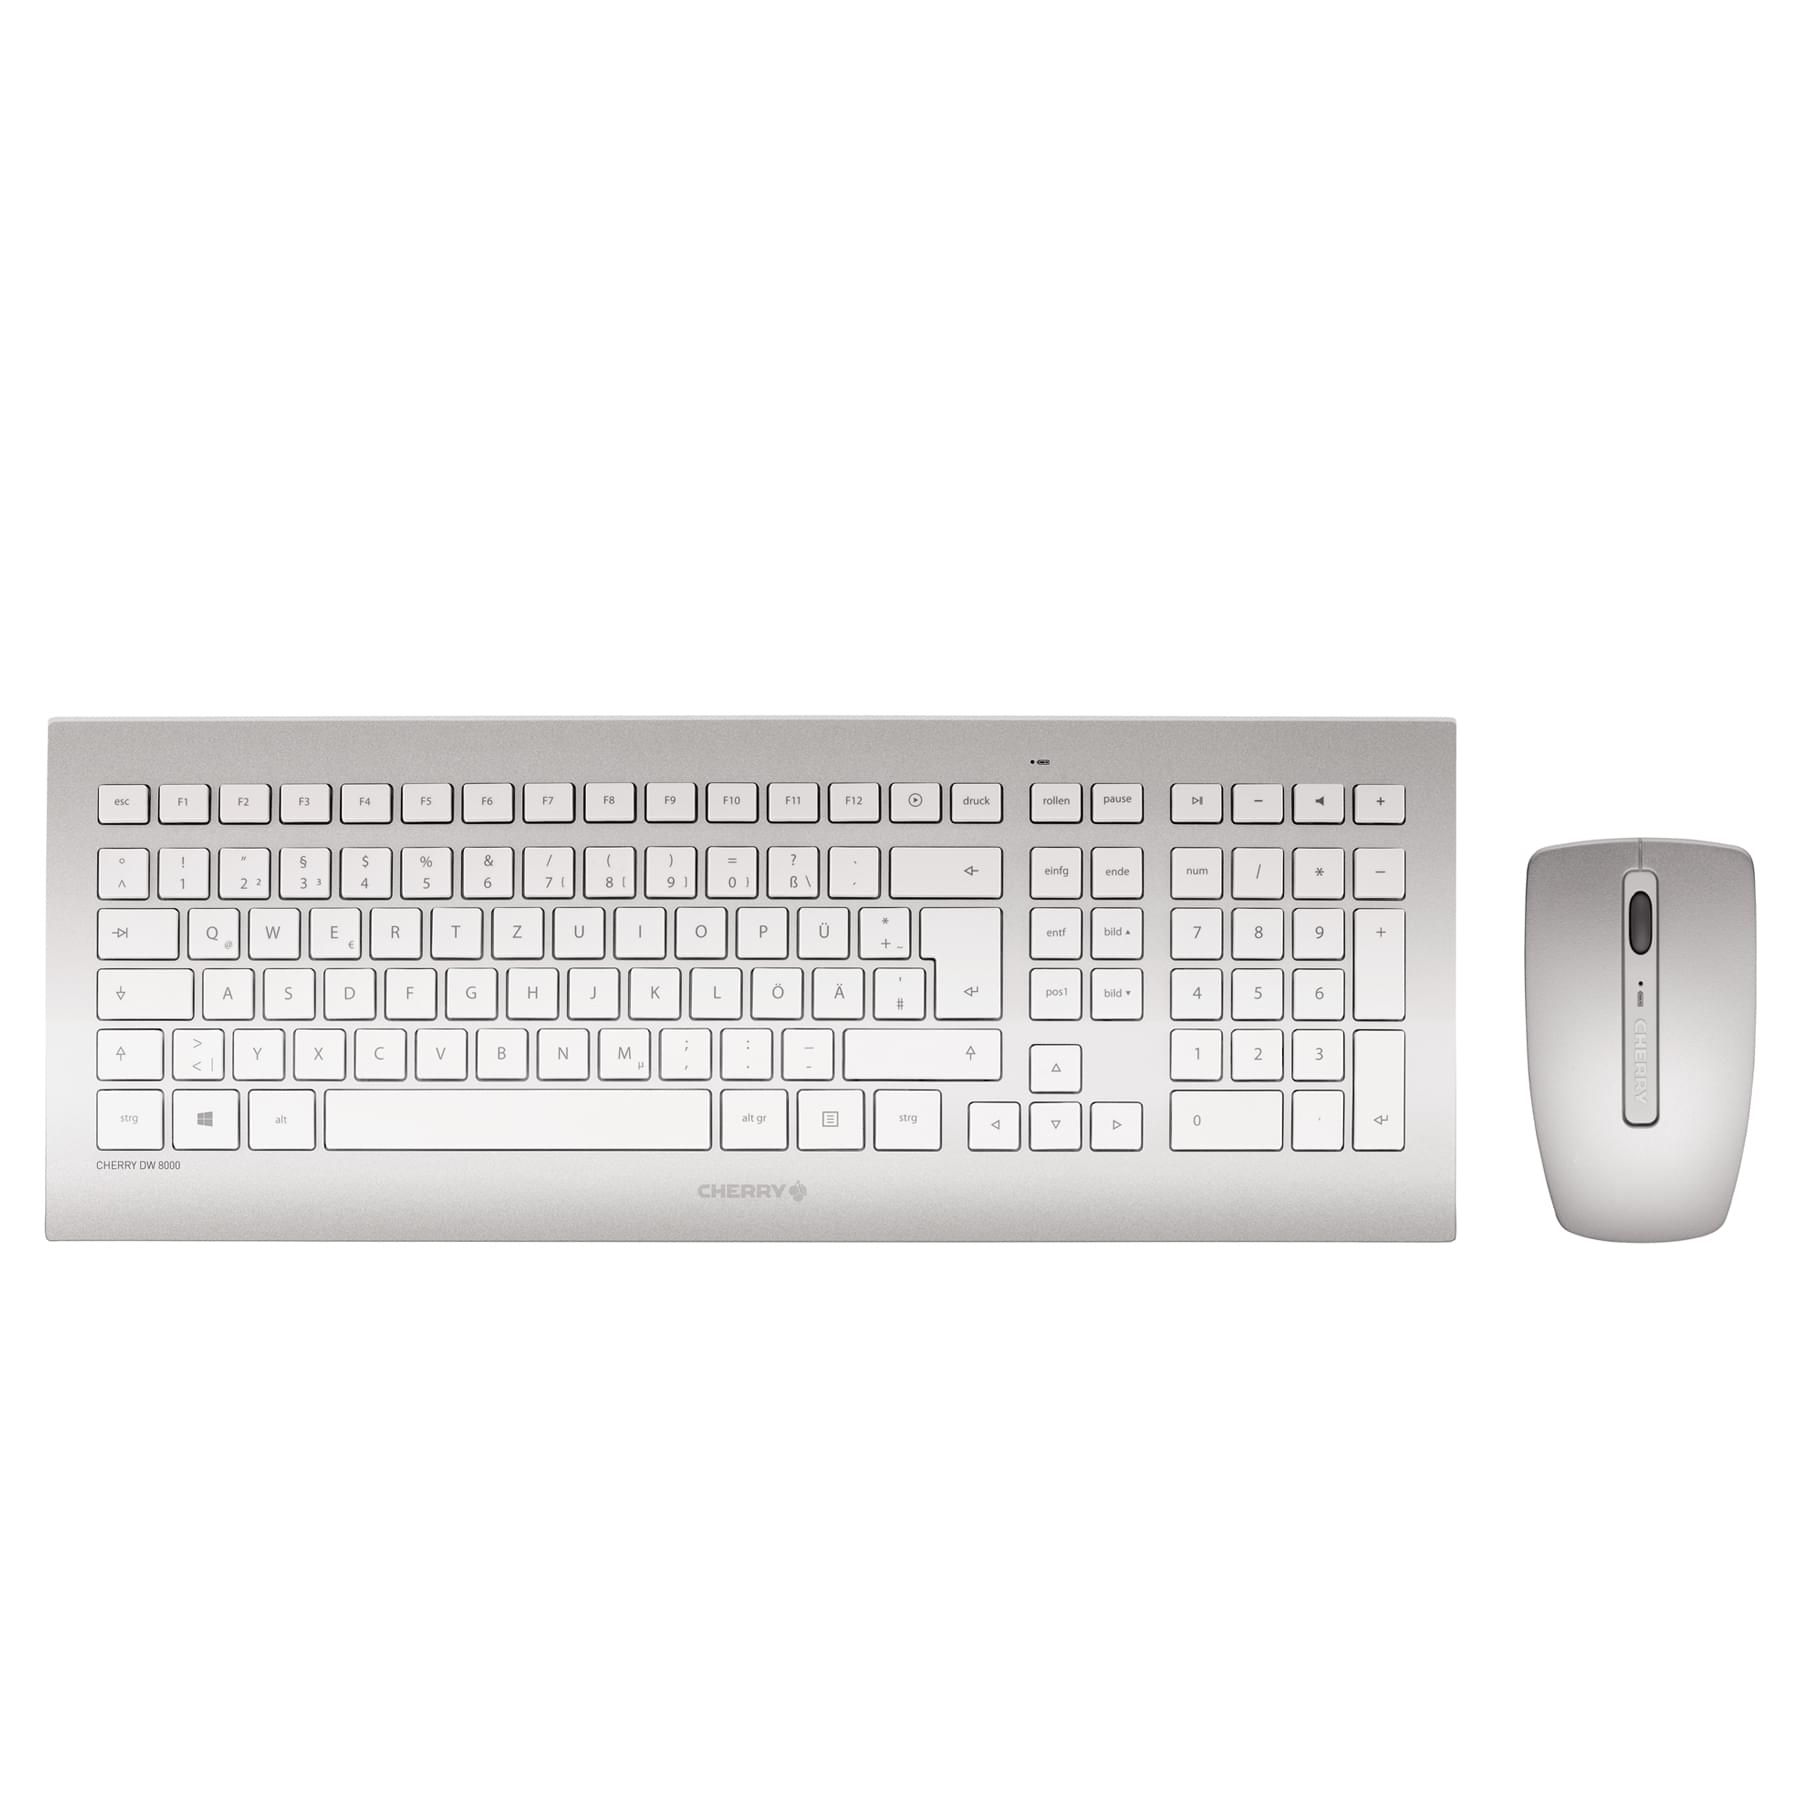 Cherry DW 8000 (blanc/silver) - Pack Clavier/Souris - Cybertek.fr - 0